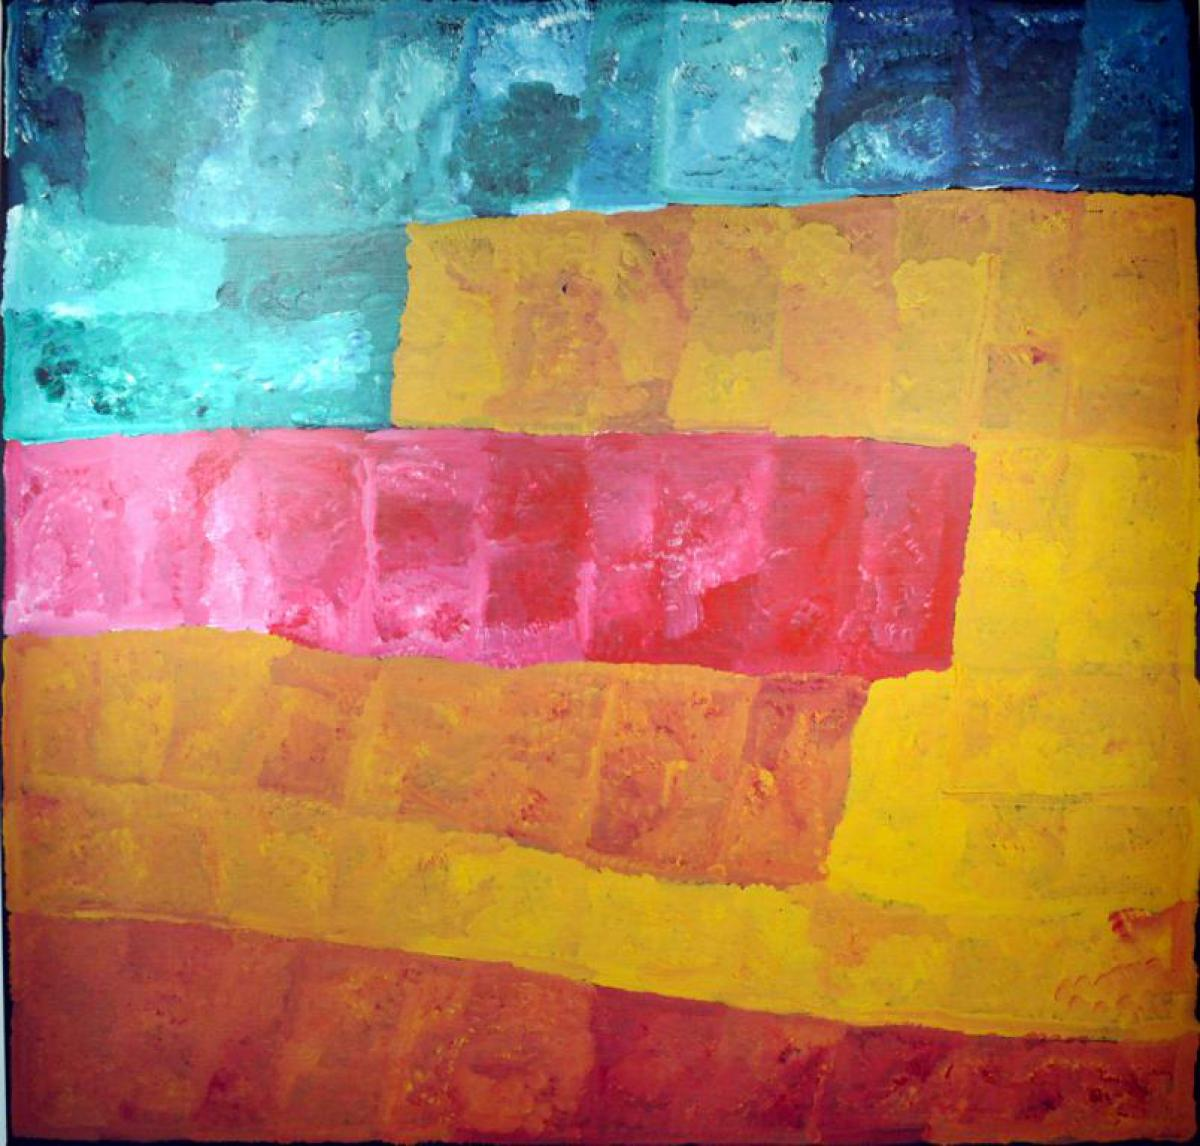 Kudditji Kngwarreye, 'My Country' August 2005 A6397, Acrylic on canvas, 200 x 200 cm